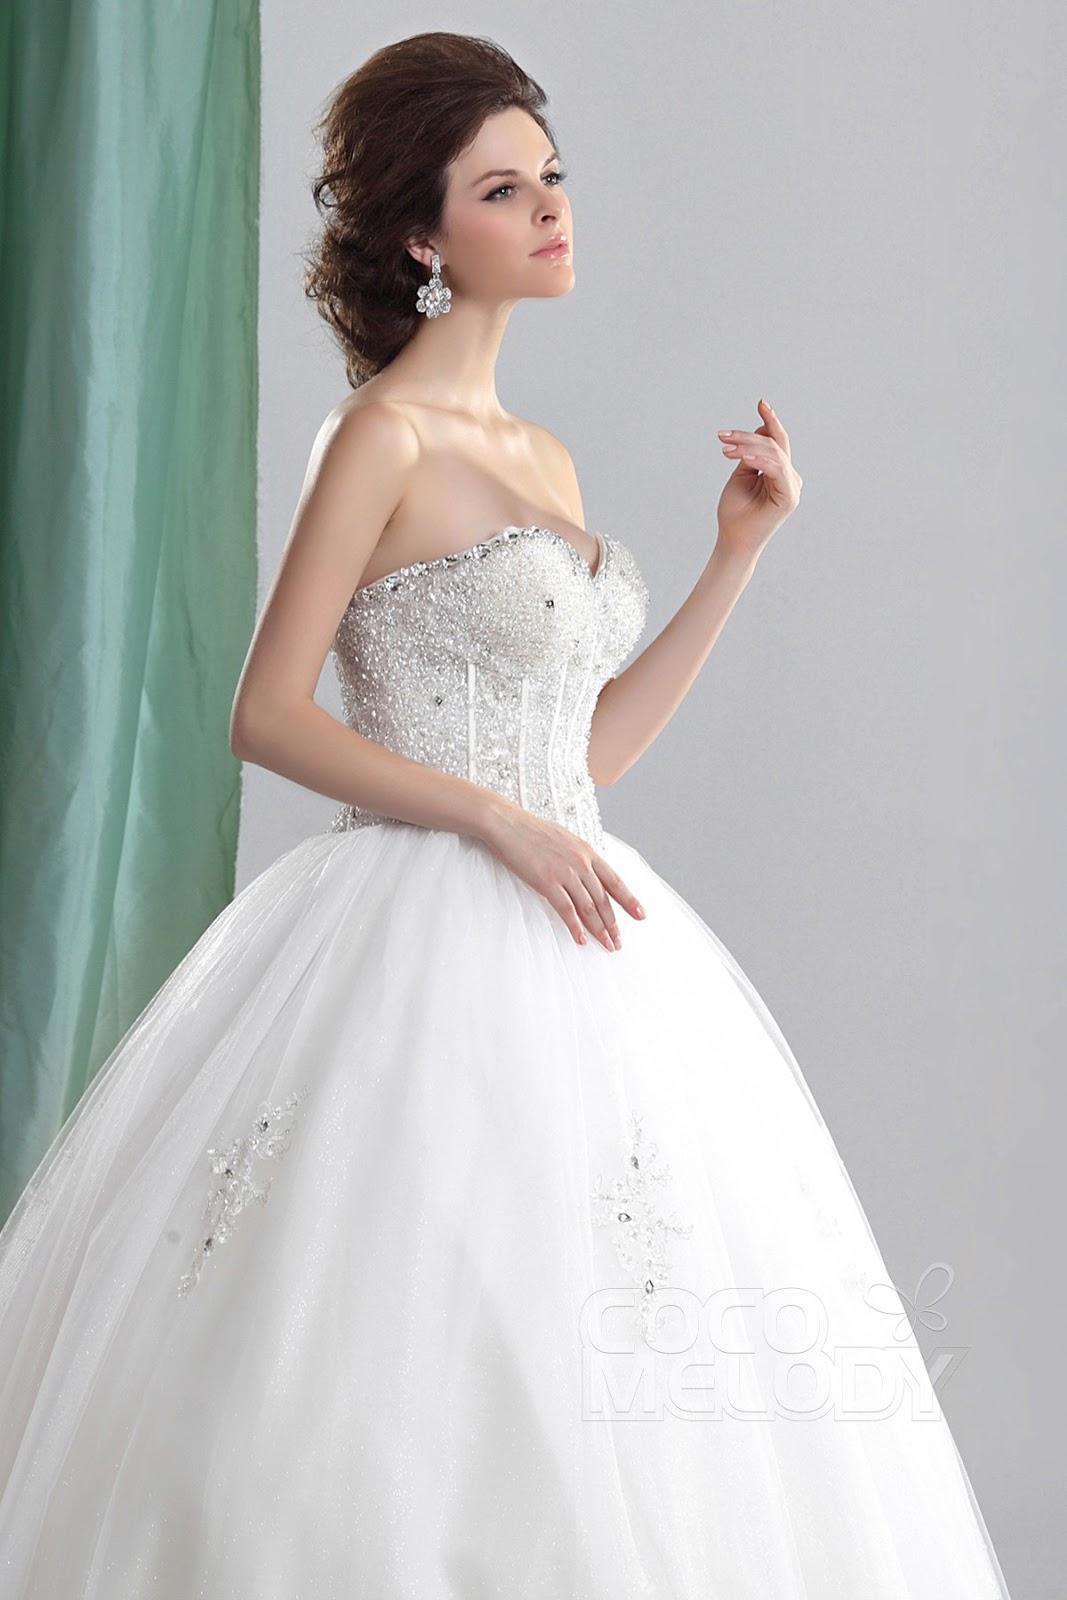 princess flower girl dresses: Light classic racing wedding dress can ...